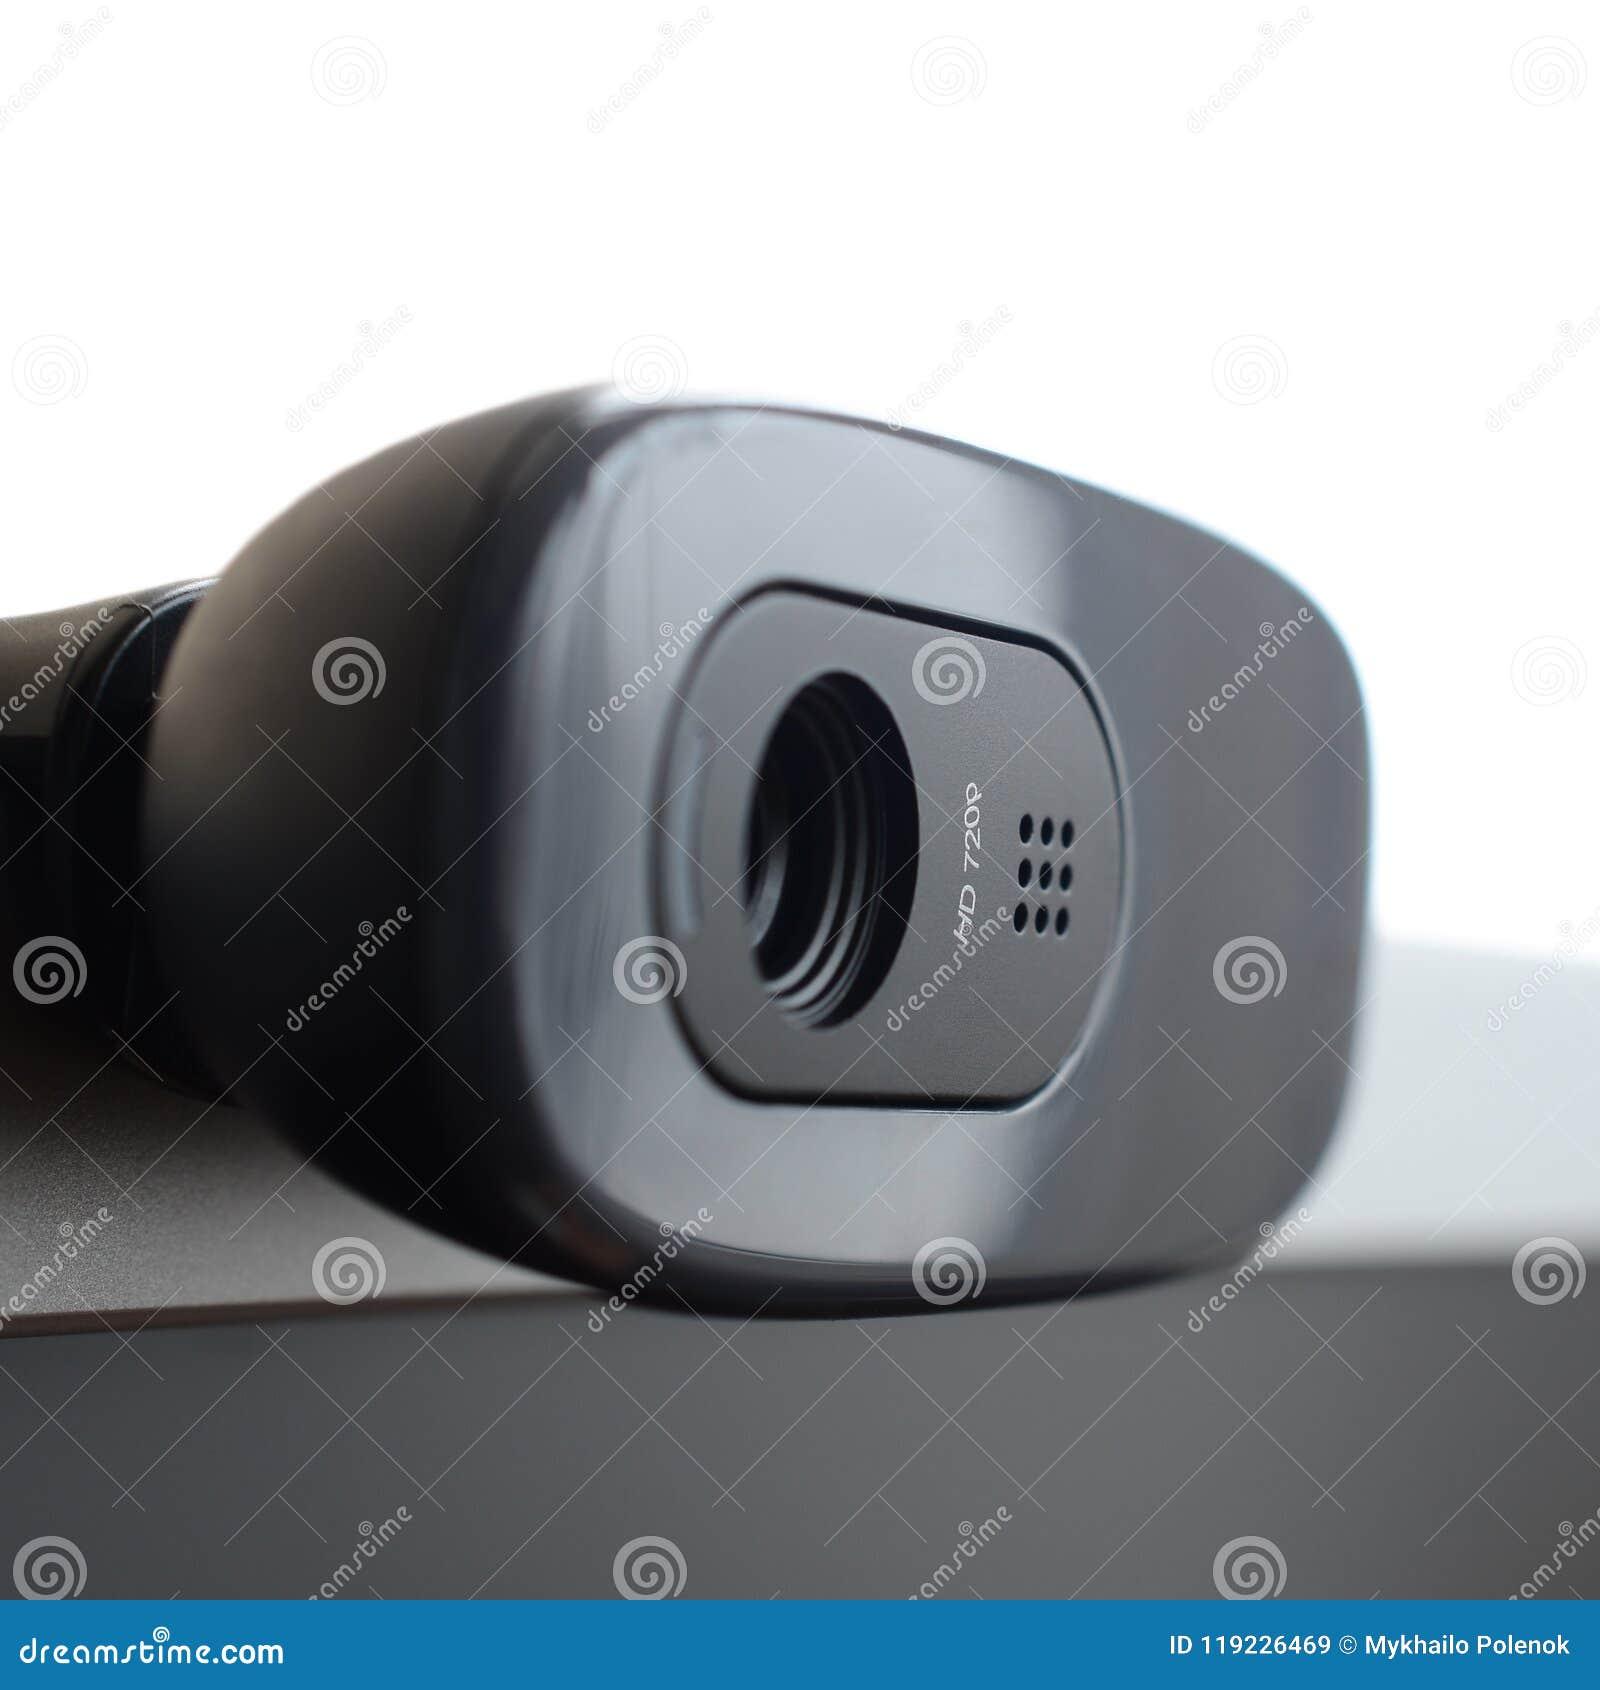 Webcamera plus for windows mobile download.